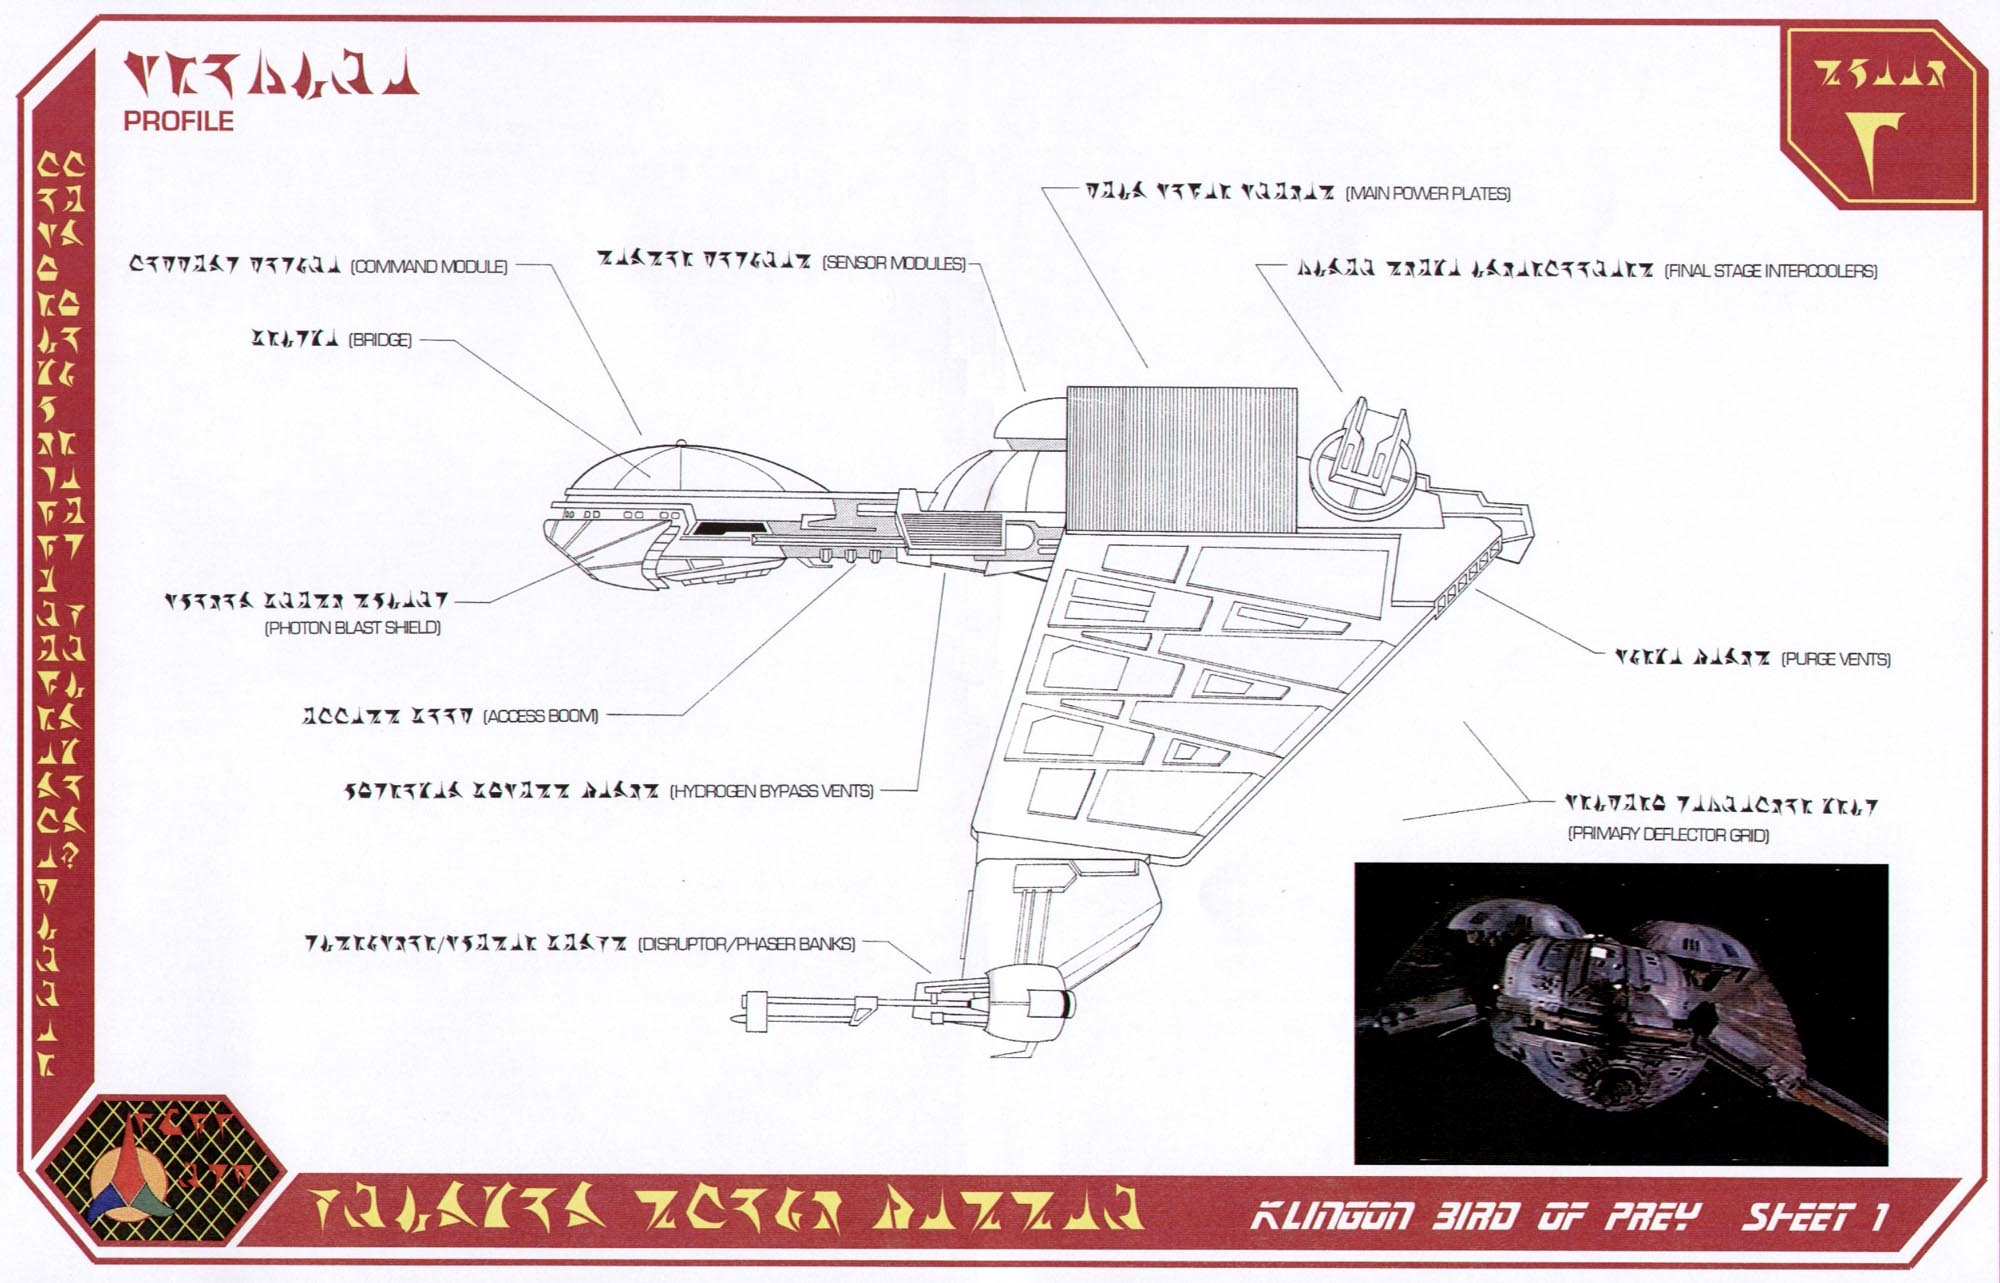 klingonbirdofpreysheet1.jpg